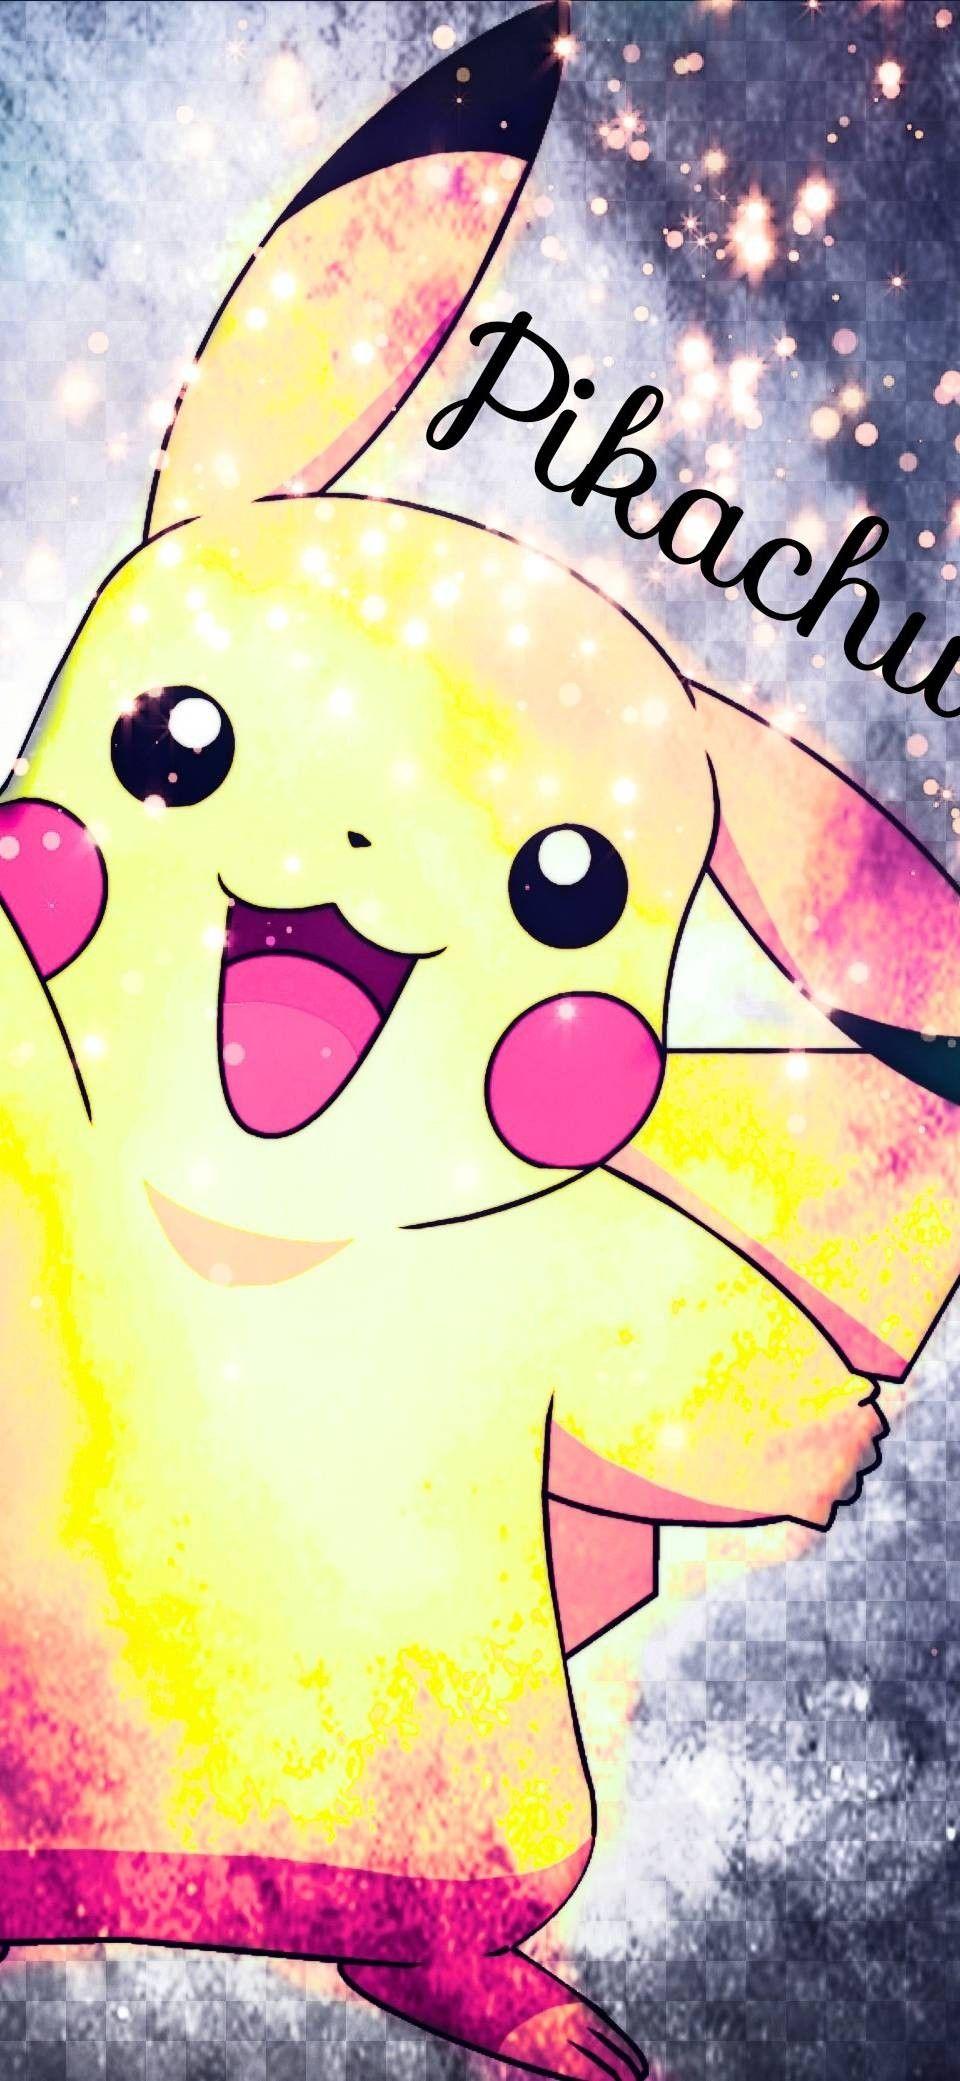 Cute Pikachu Hd Images Pikachu Wallpaper Iphone Cute Pokemon Wallpaper Pikachu Wallpaper